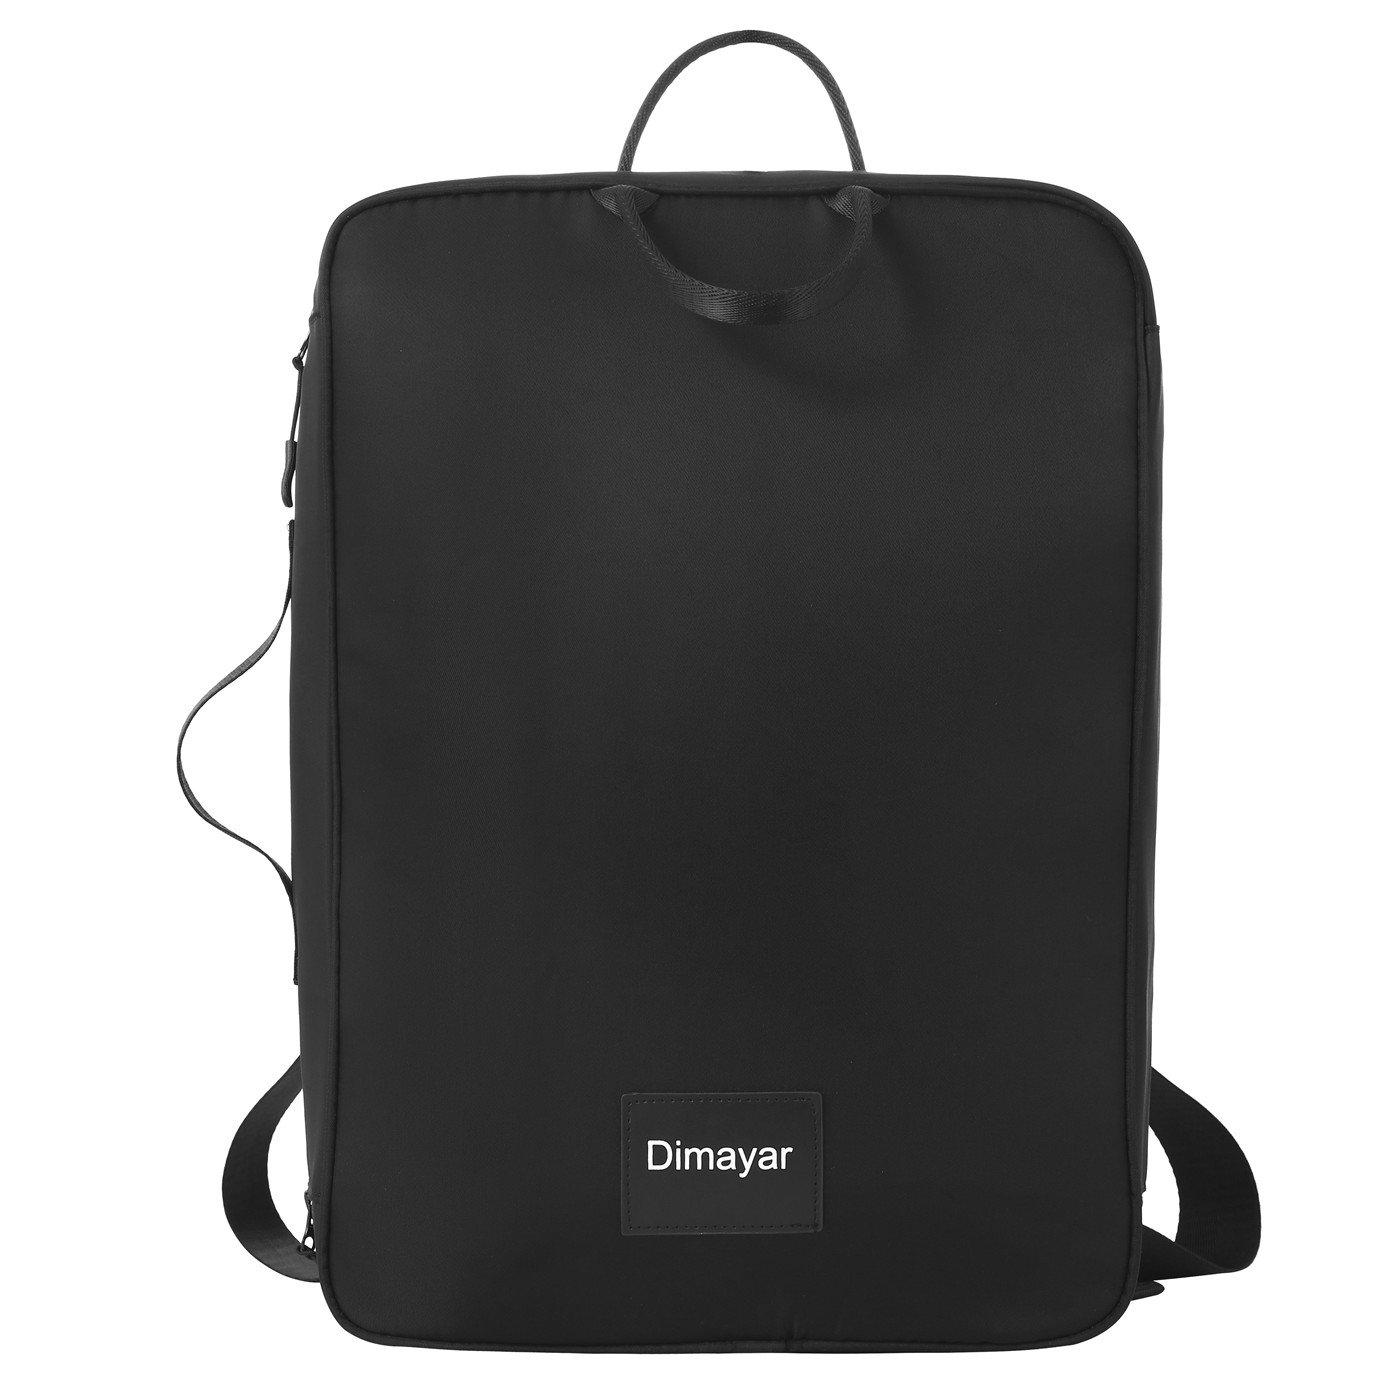 Travel Backpack by Dimayar Water Resistant Traveling Backpack for Men Women Lightweight Slim Business Backpack 15.6 Travel Laptop Backpack Black